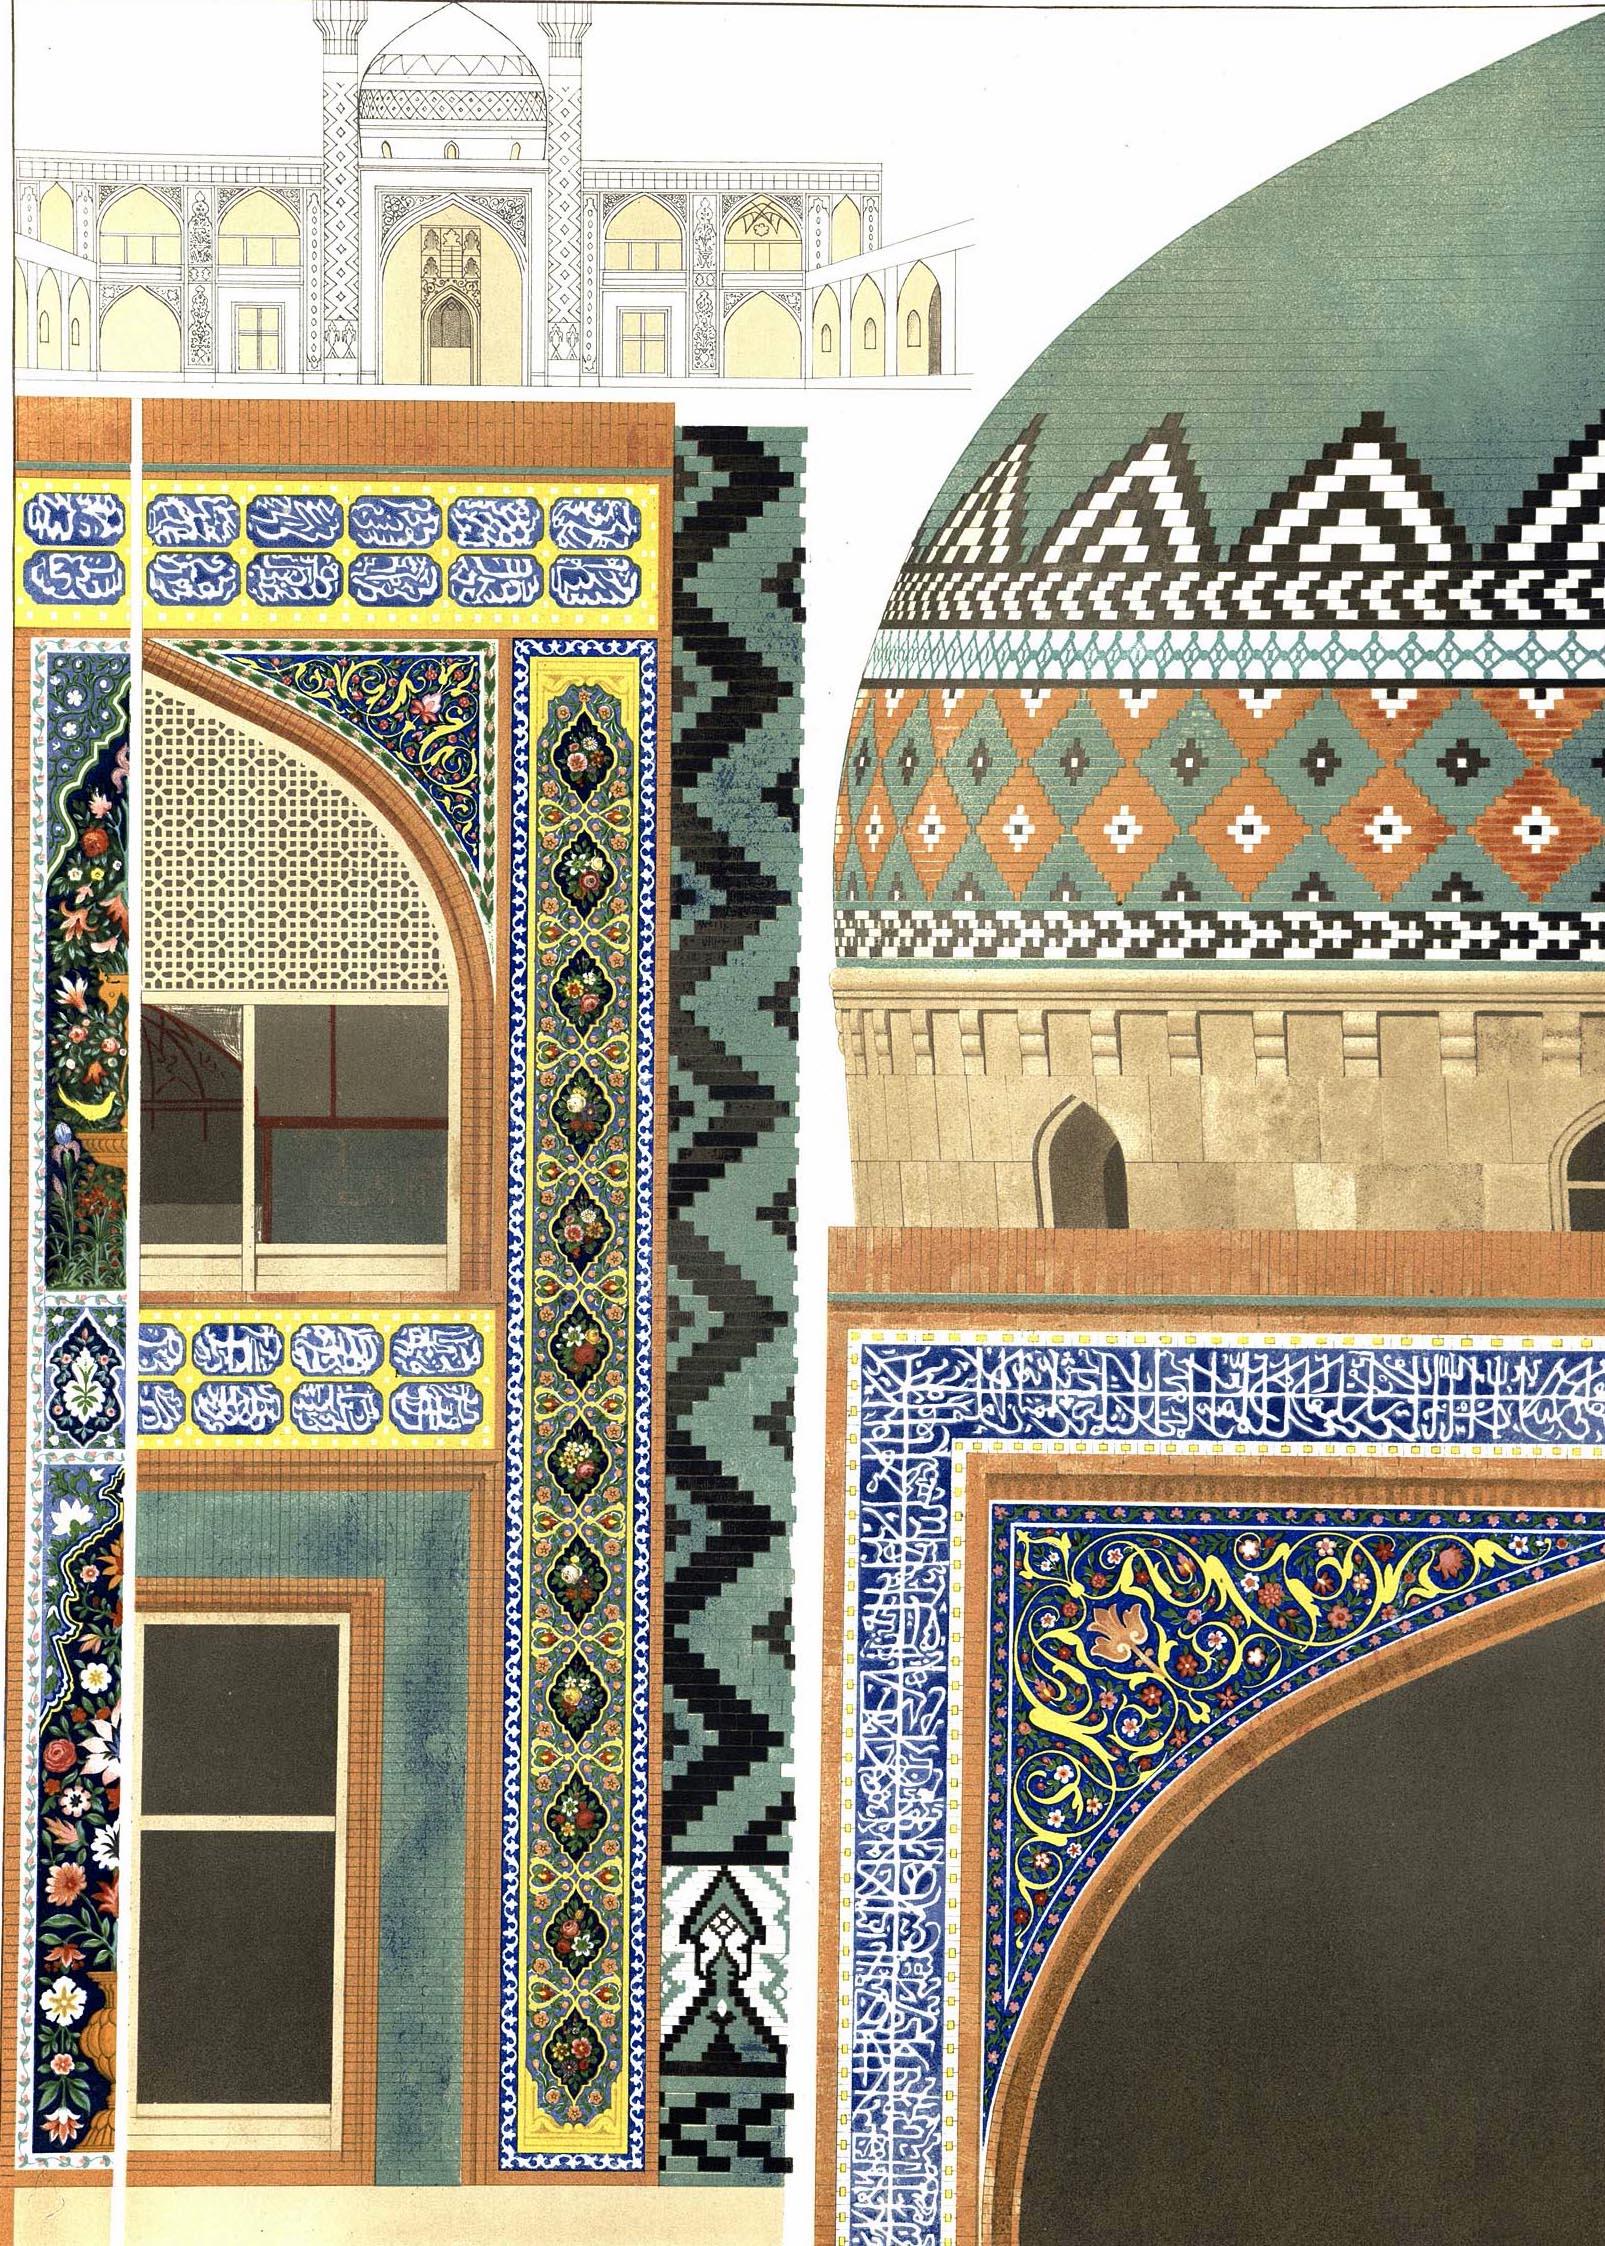 21. Erivan. Details des faiences de la mosquee / Эривань. Детали мозаики фаянса мечети